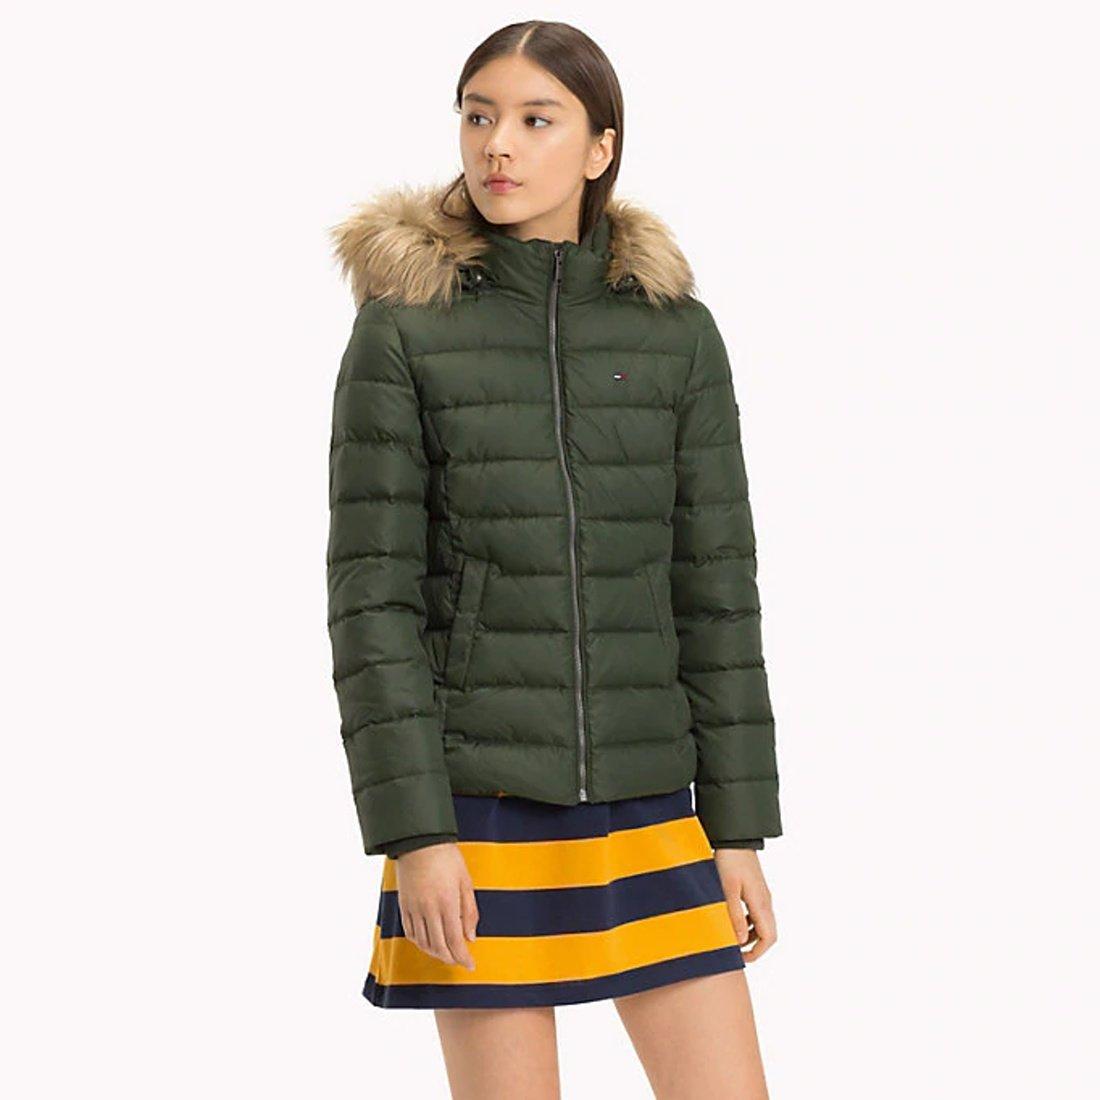 70048b972 Tommy Hilfiger dámska zelená páperová bunda Essential - Glami.sk